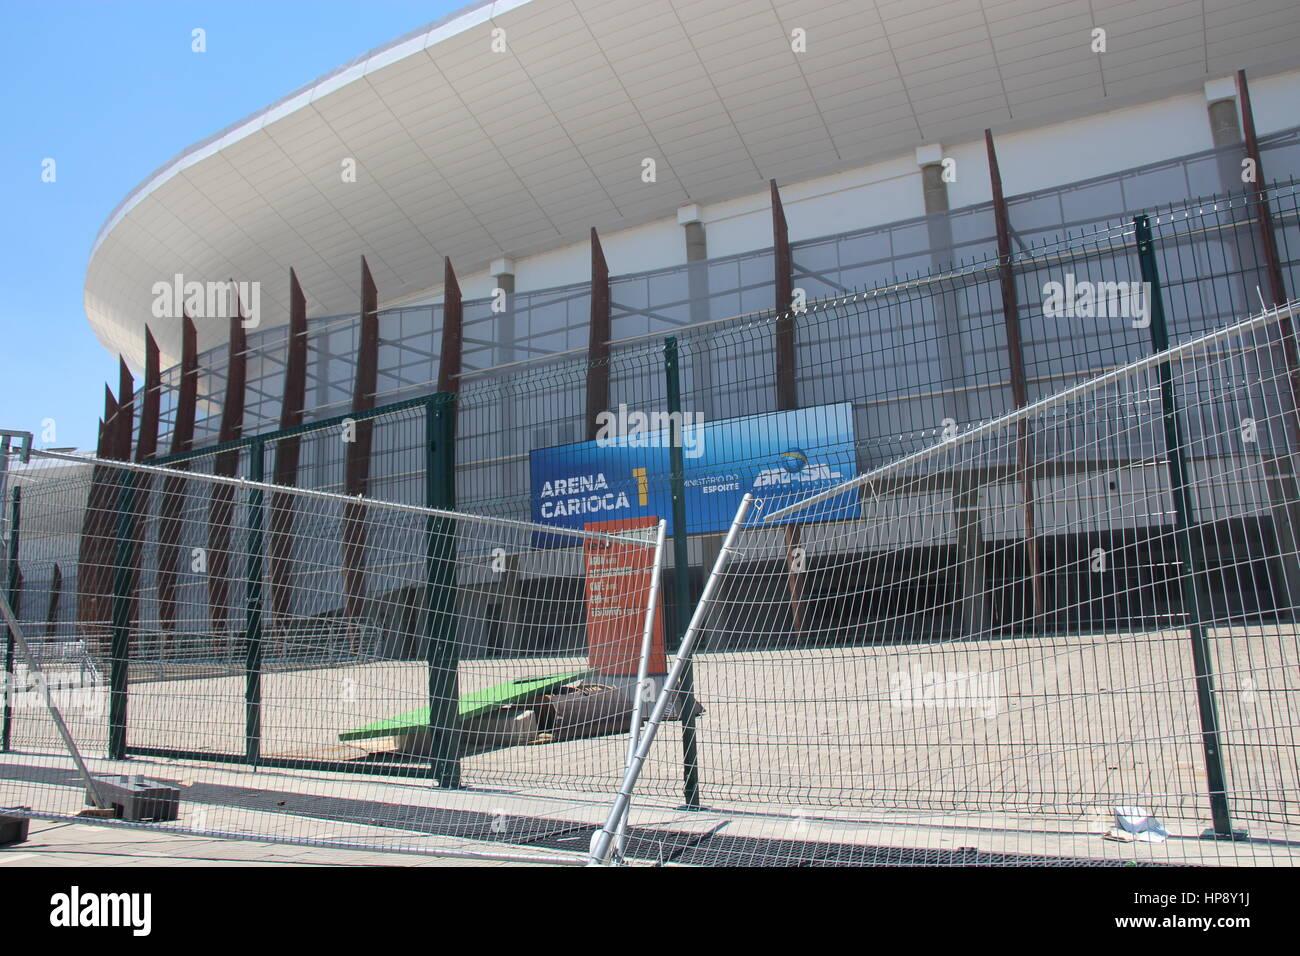 Ein Zaun vor der Olympischen Arena Carioca 1 in Rio De Janeiro, Brasilien, 18. Februar 2017. Foto: Isaac Risco-Rodriguez/dpa Stockfoto